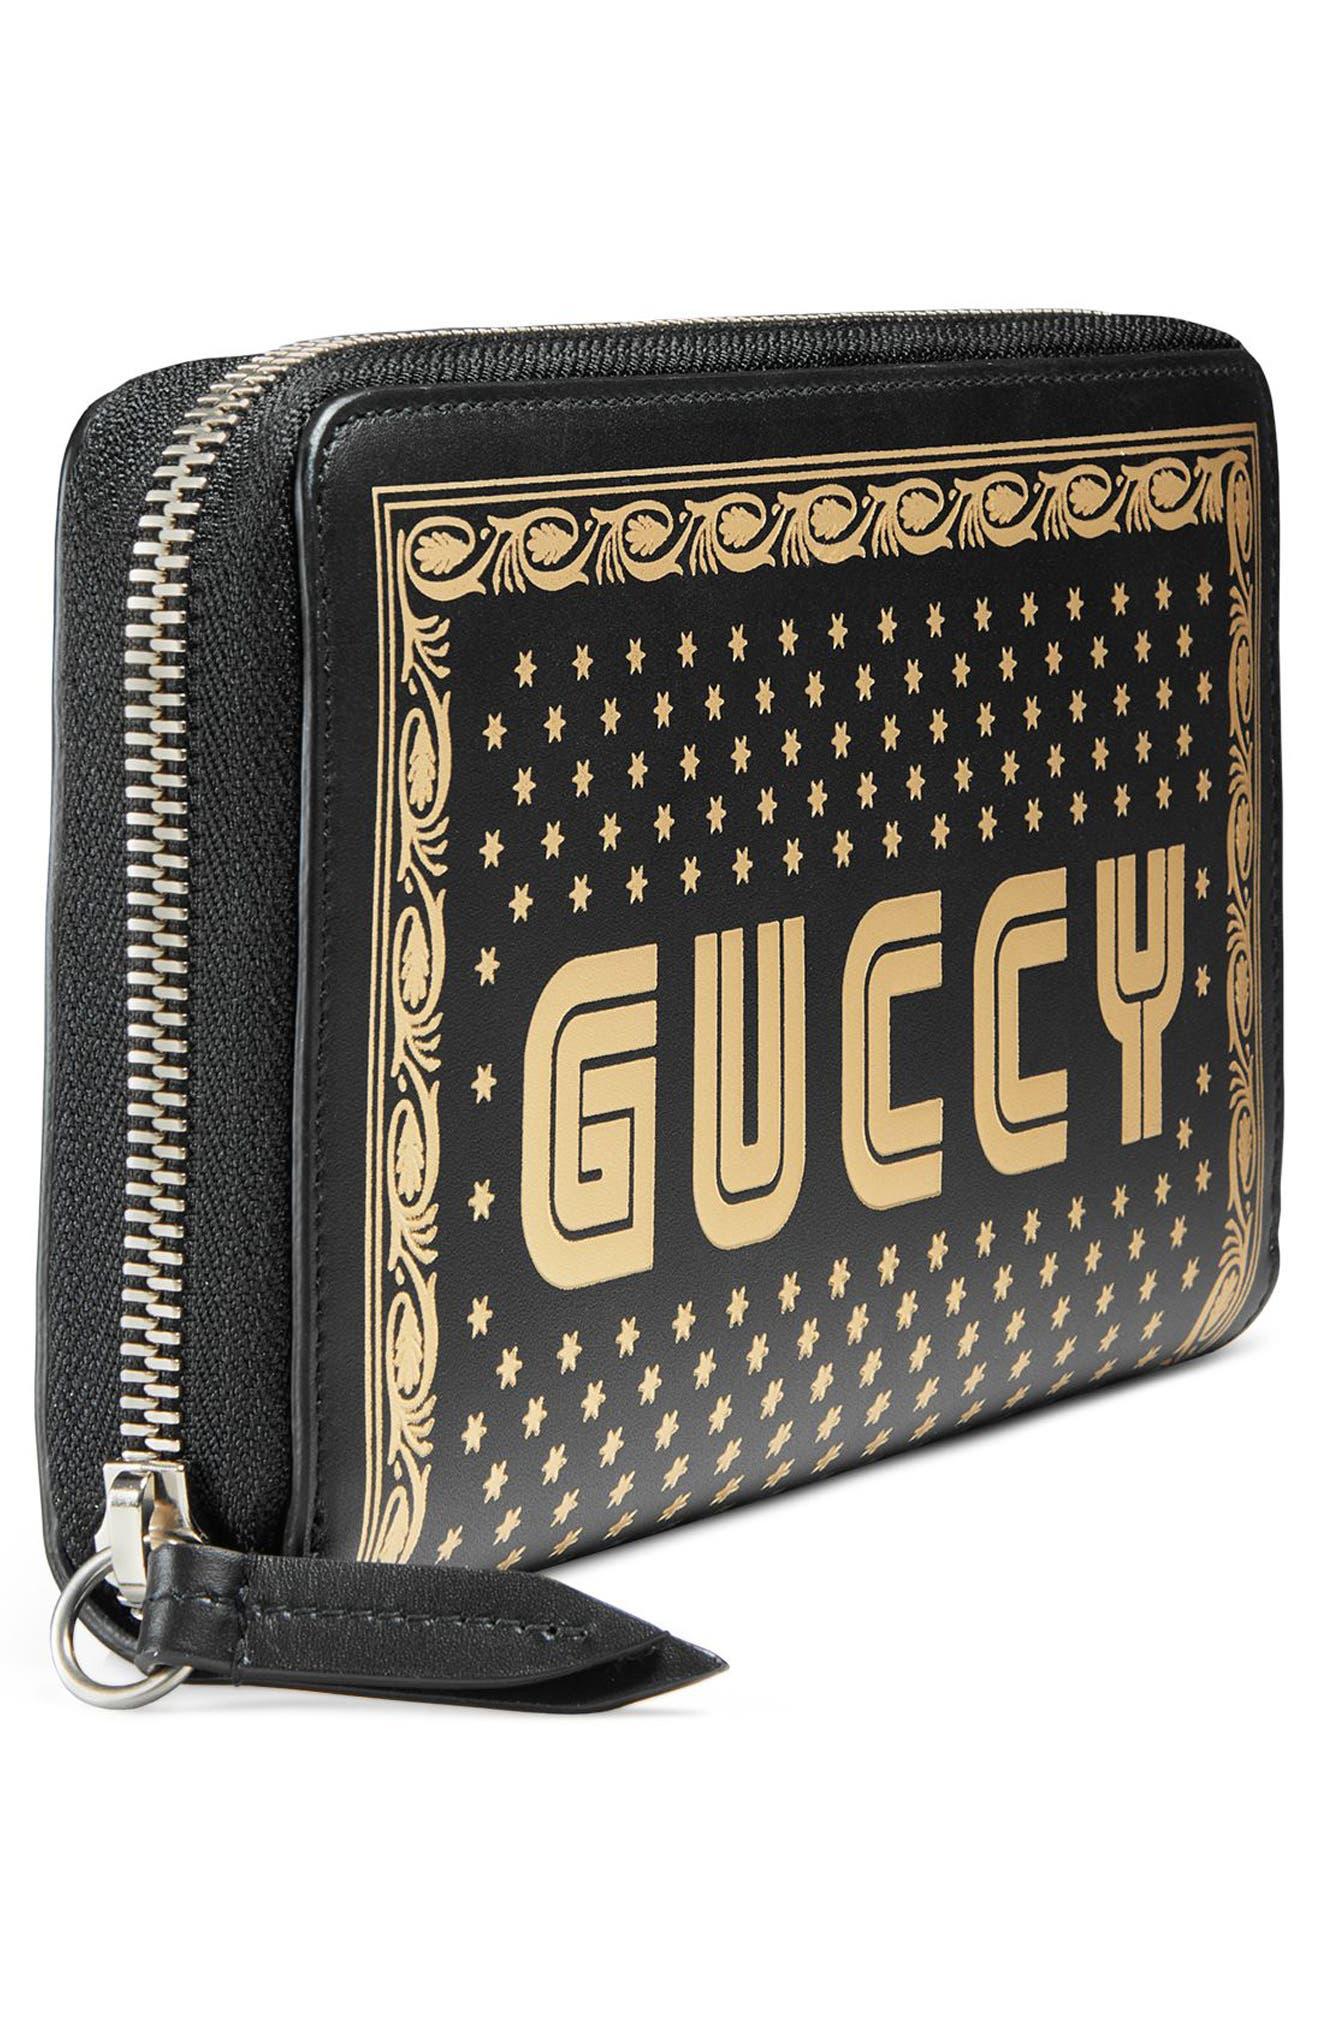 Guccy Logo Moon & Stars Leather Zip Around Wallet,                             Alternate thumbnail 4, color,                             Nero/ Oro